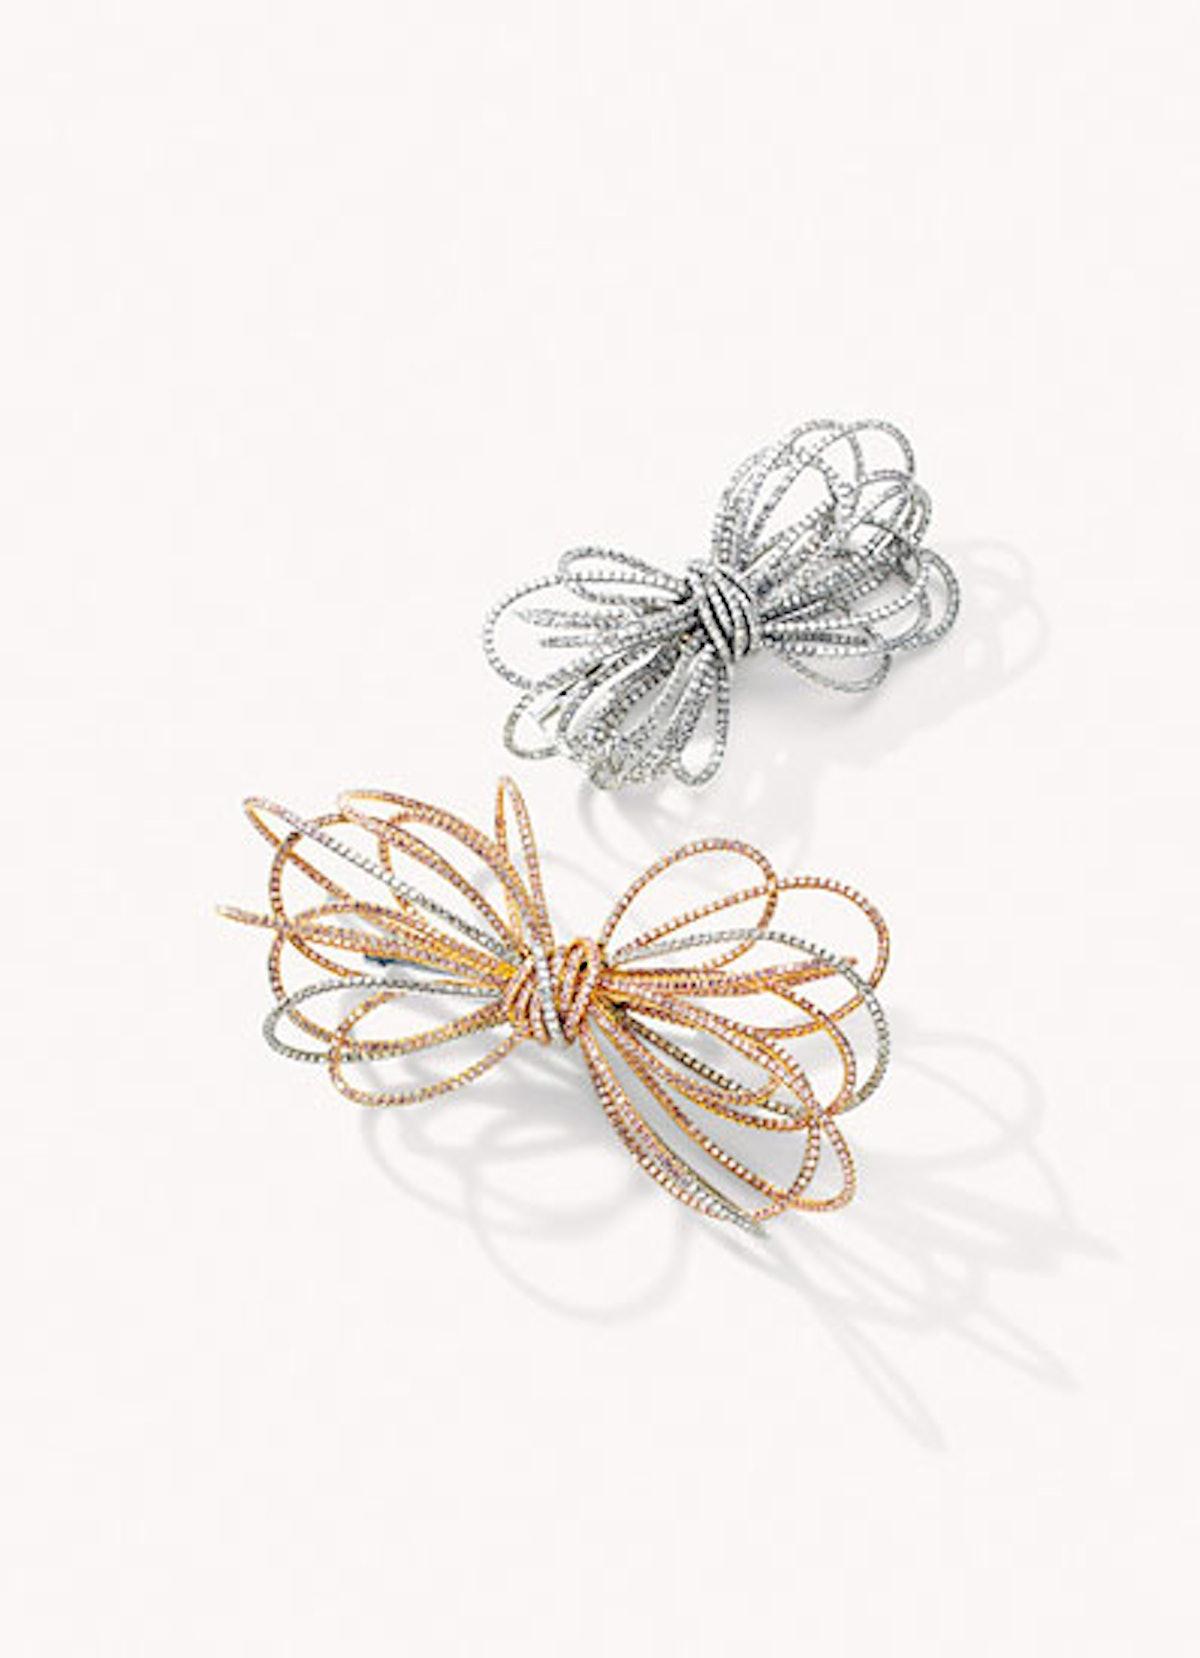 acss-claudia-mata-jewelry-picks-05-v.jpg